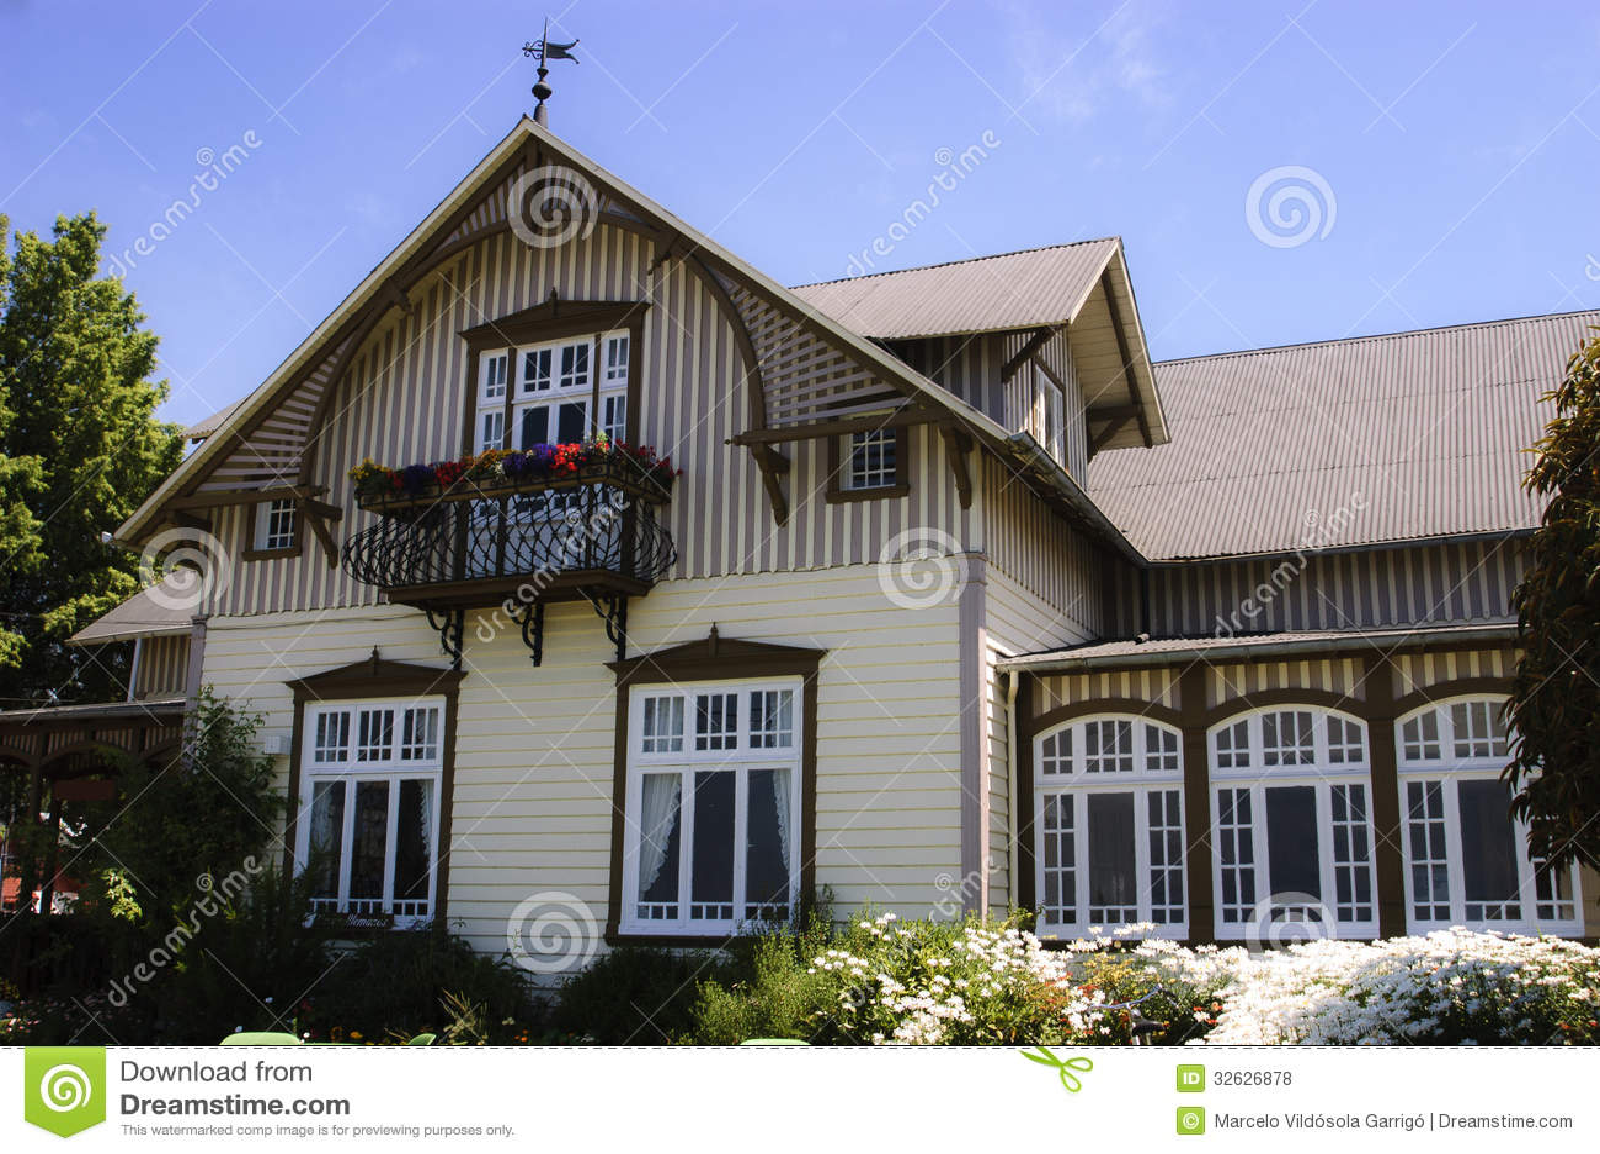 Houses Built In 1900